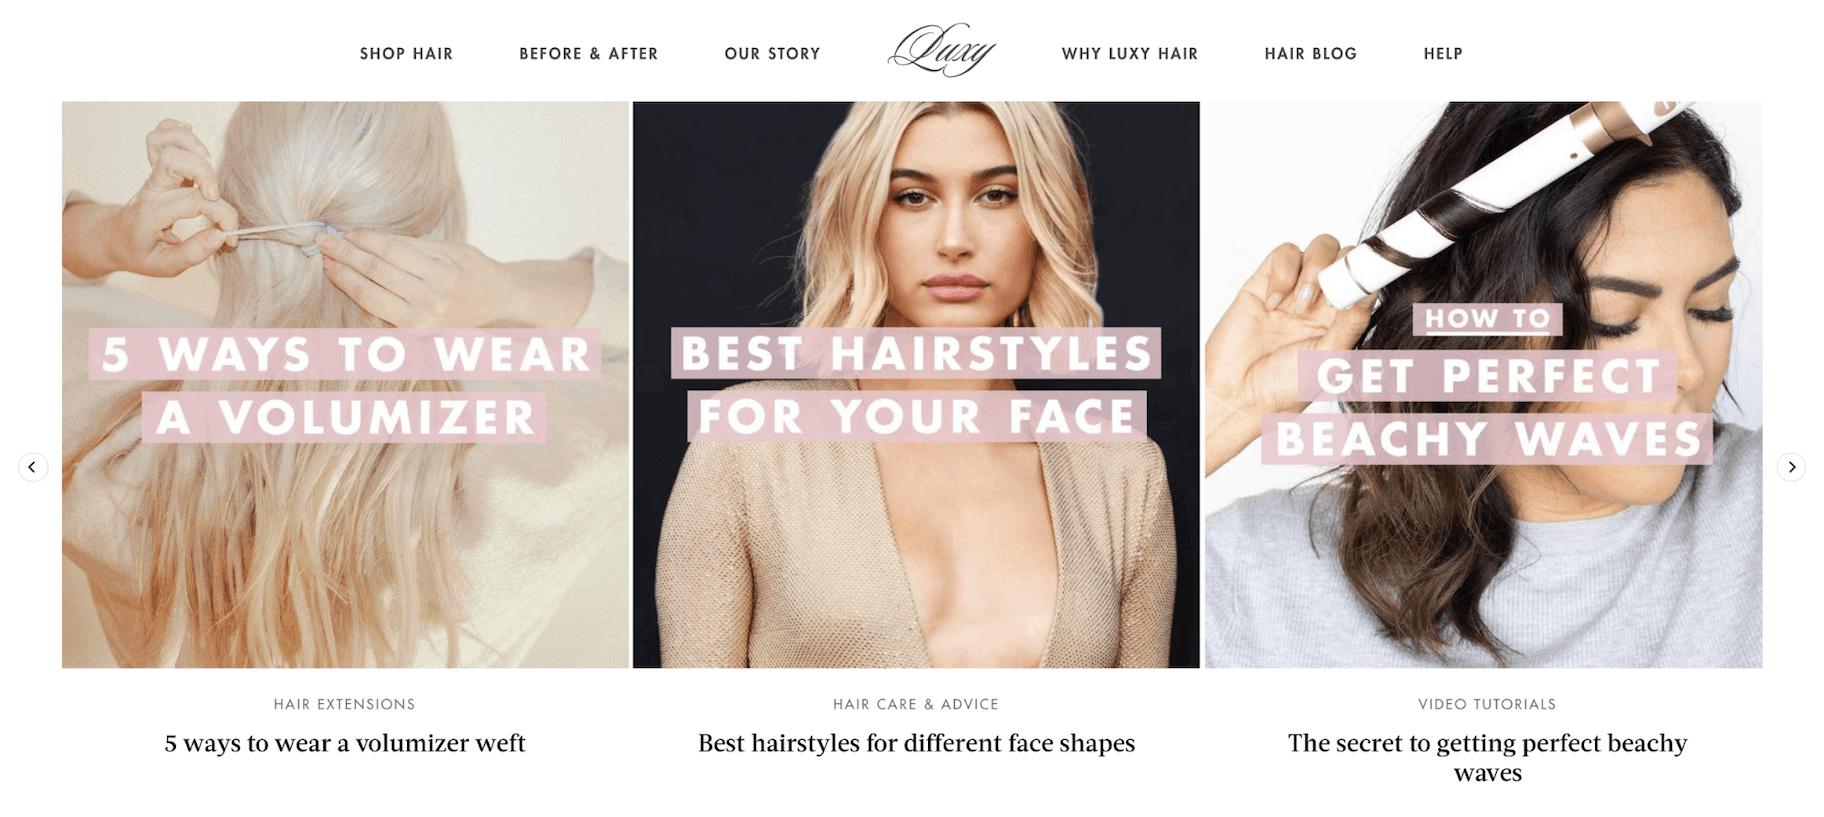 Luxy Hair Content Marketing